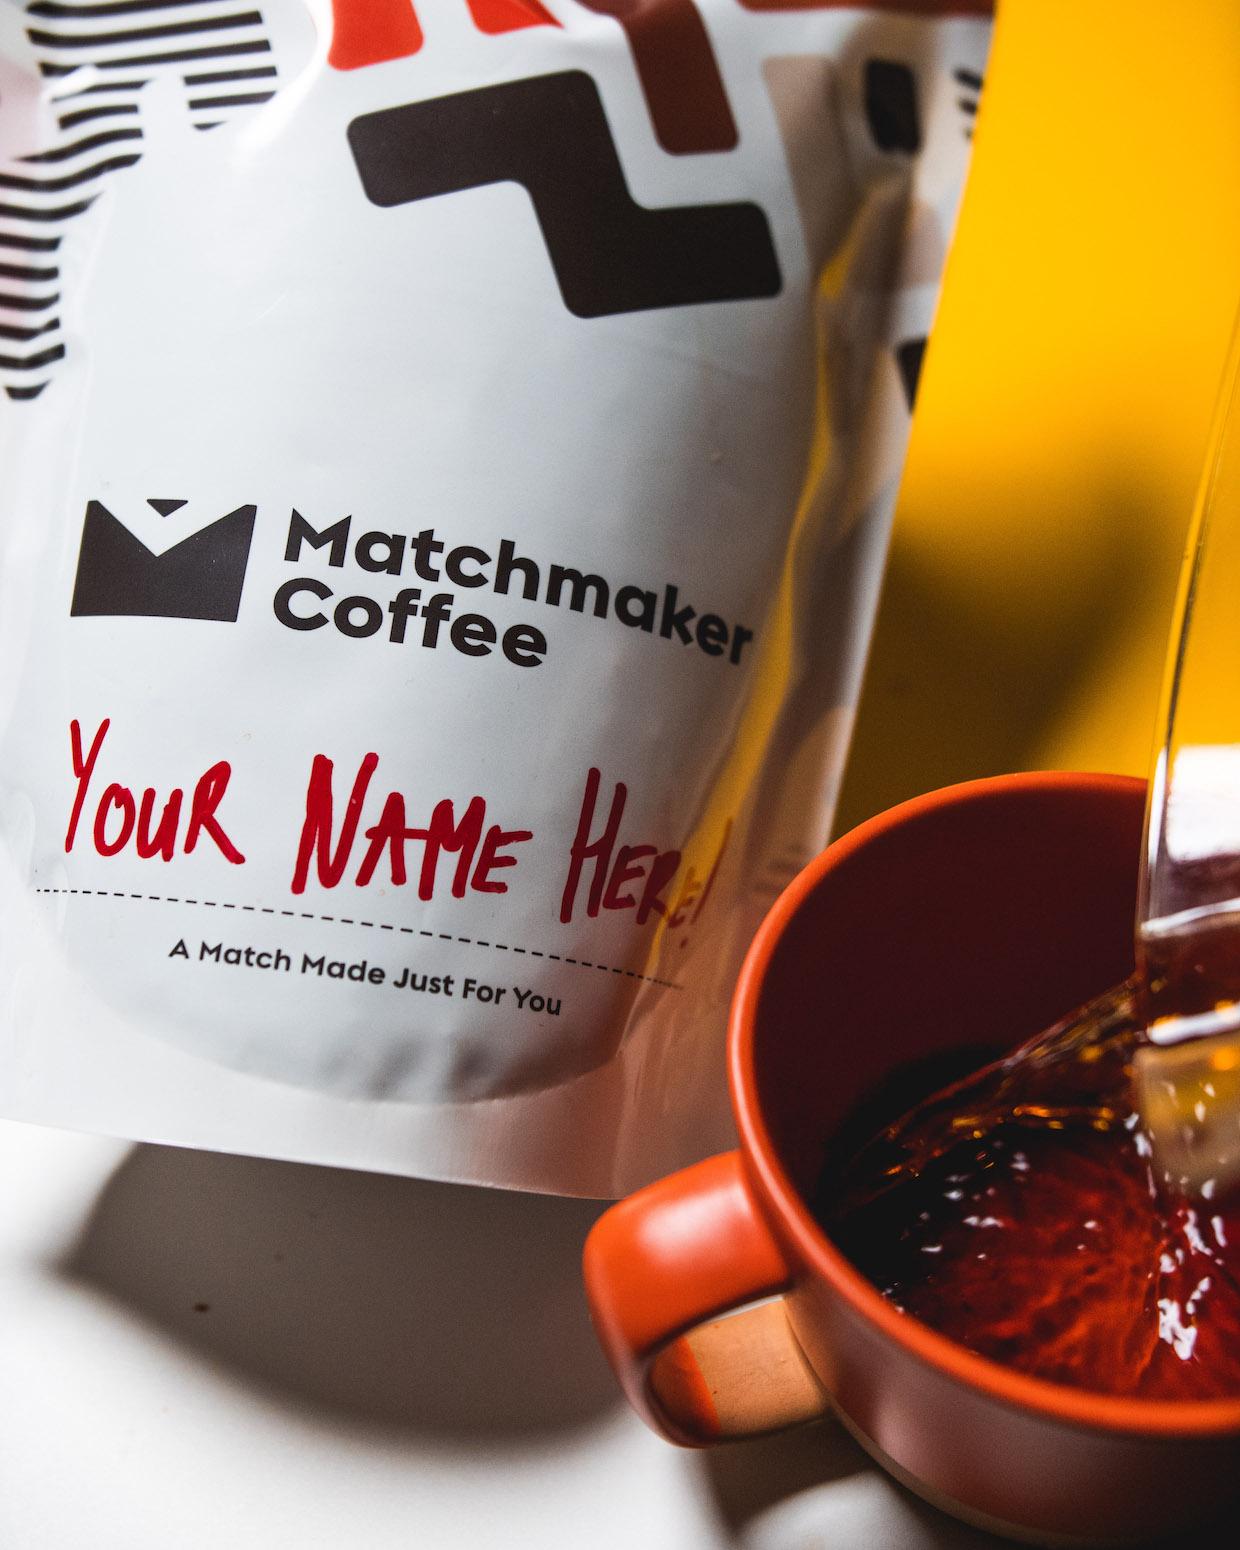 Matchmaker Votre nom ici